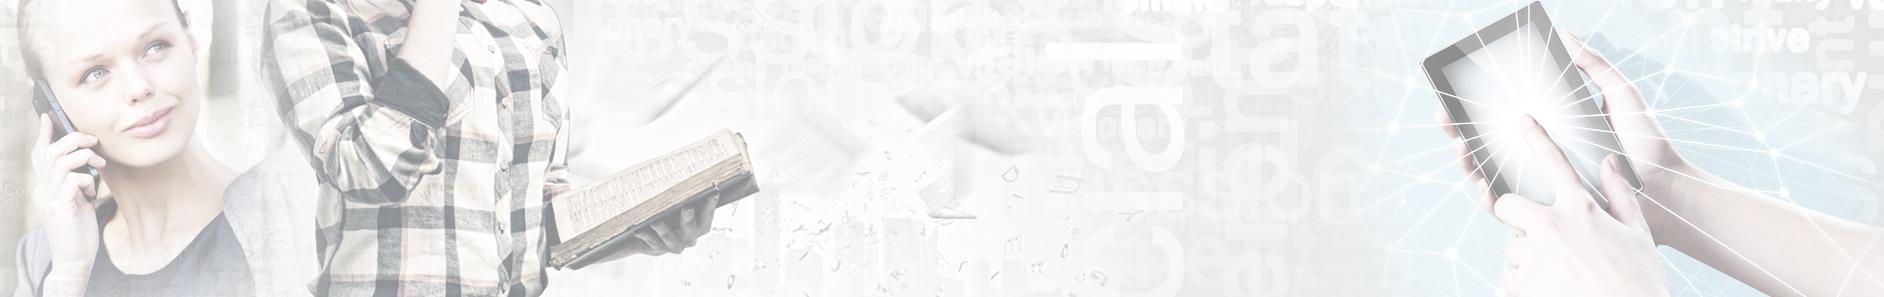 scanria-oy_yritys